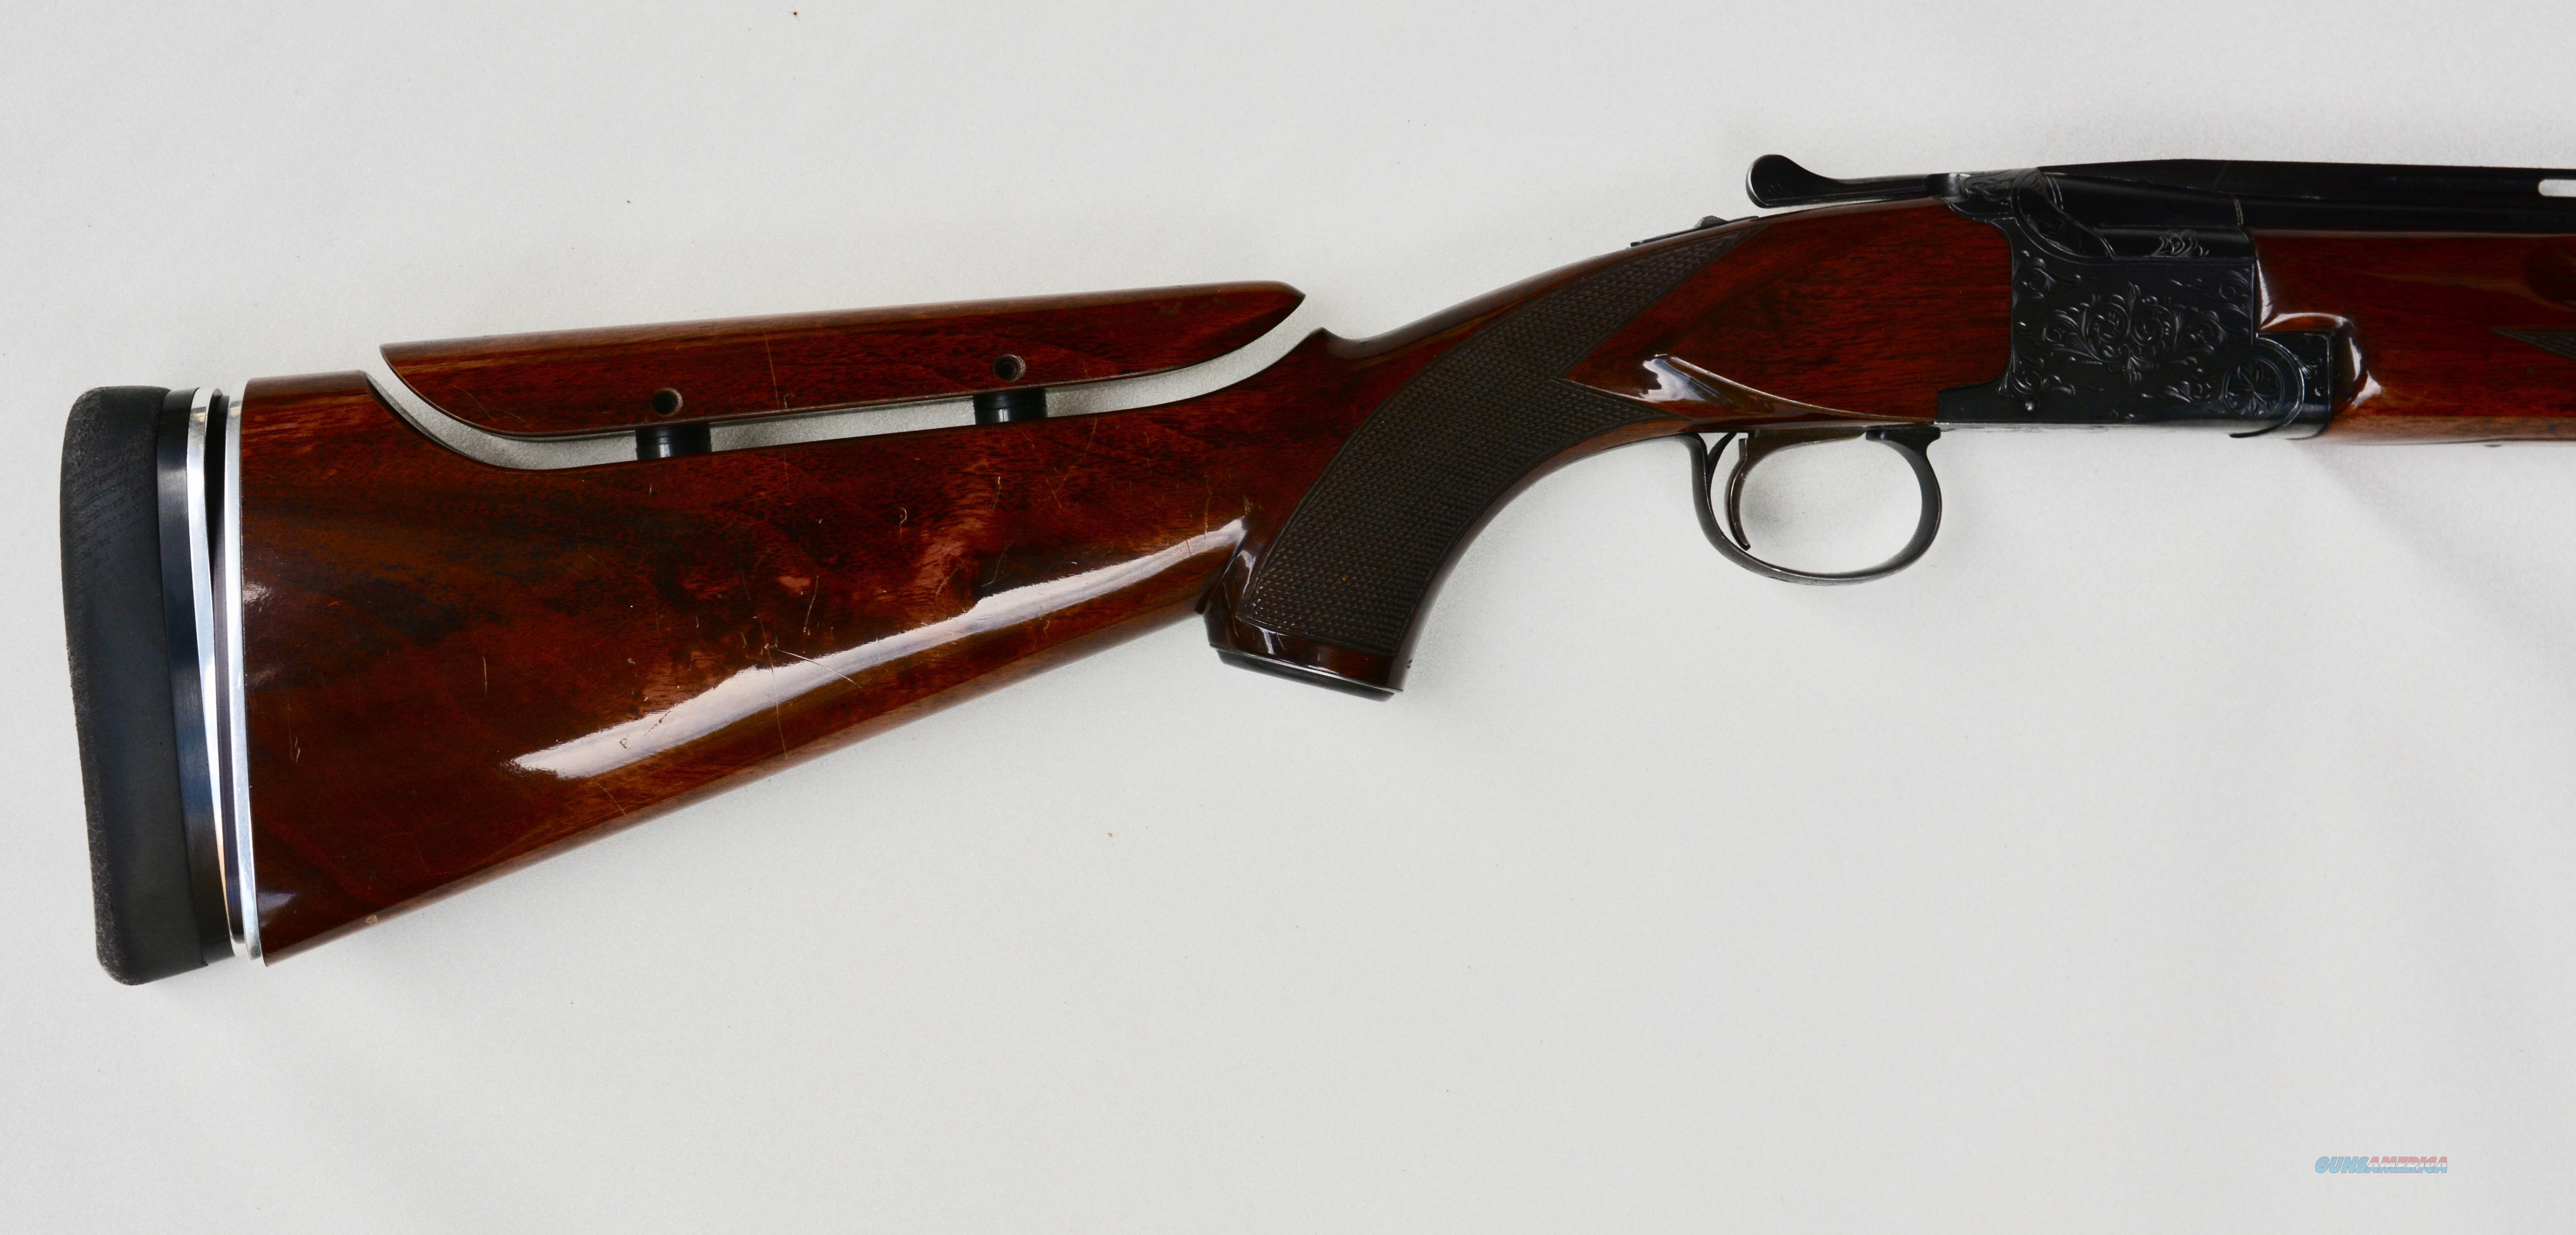 Winchester 101 Skeet Three Barrel Set  Guns > Shotguns > Winchester Shotguns - Modern > O/U > Trap/Skeet